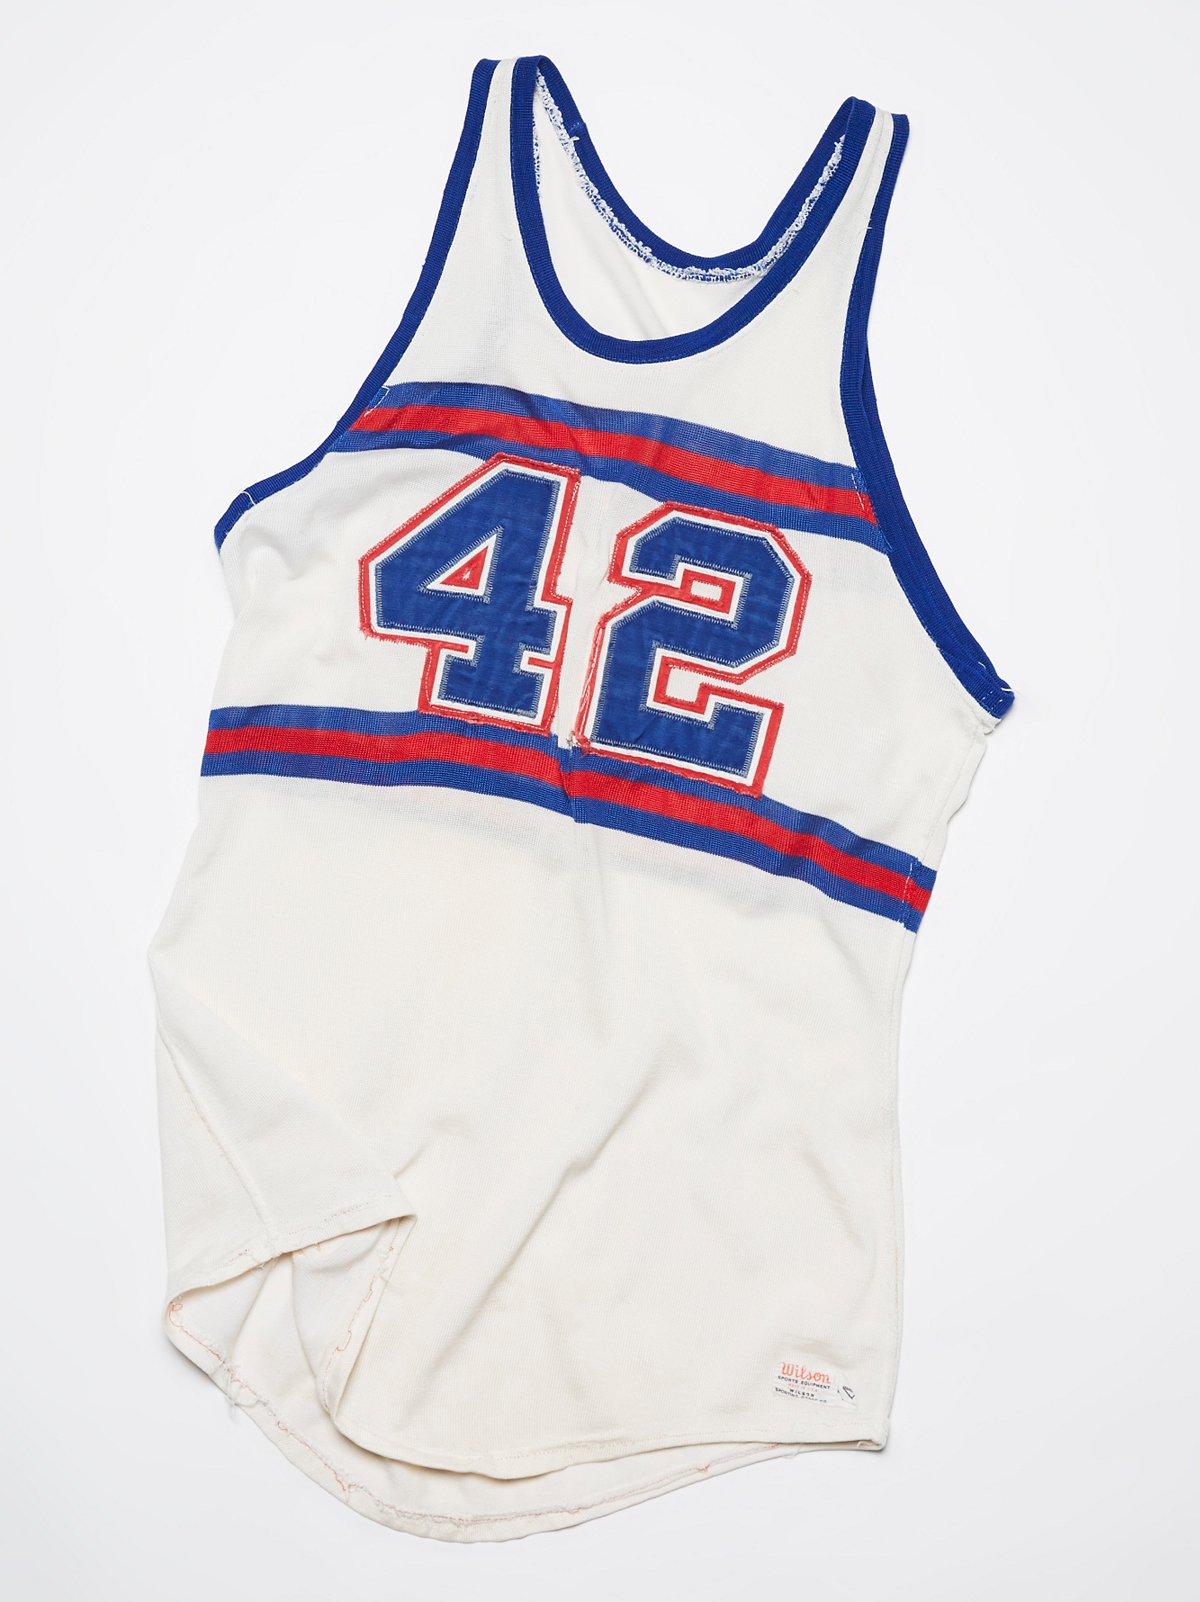 Vintage 1960s #42 Jersey